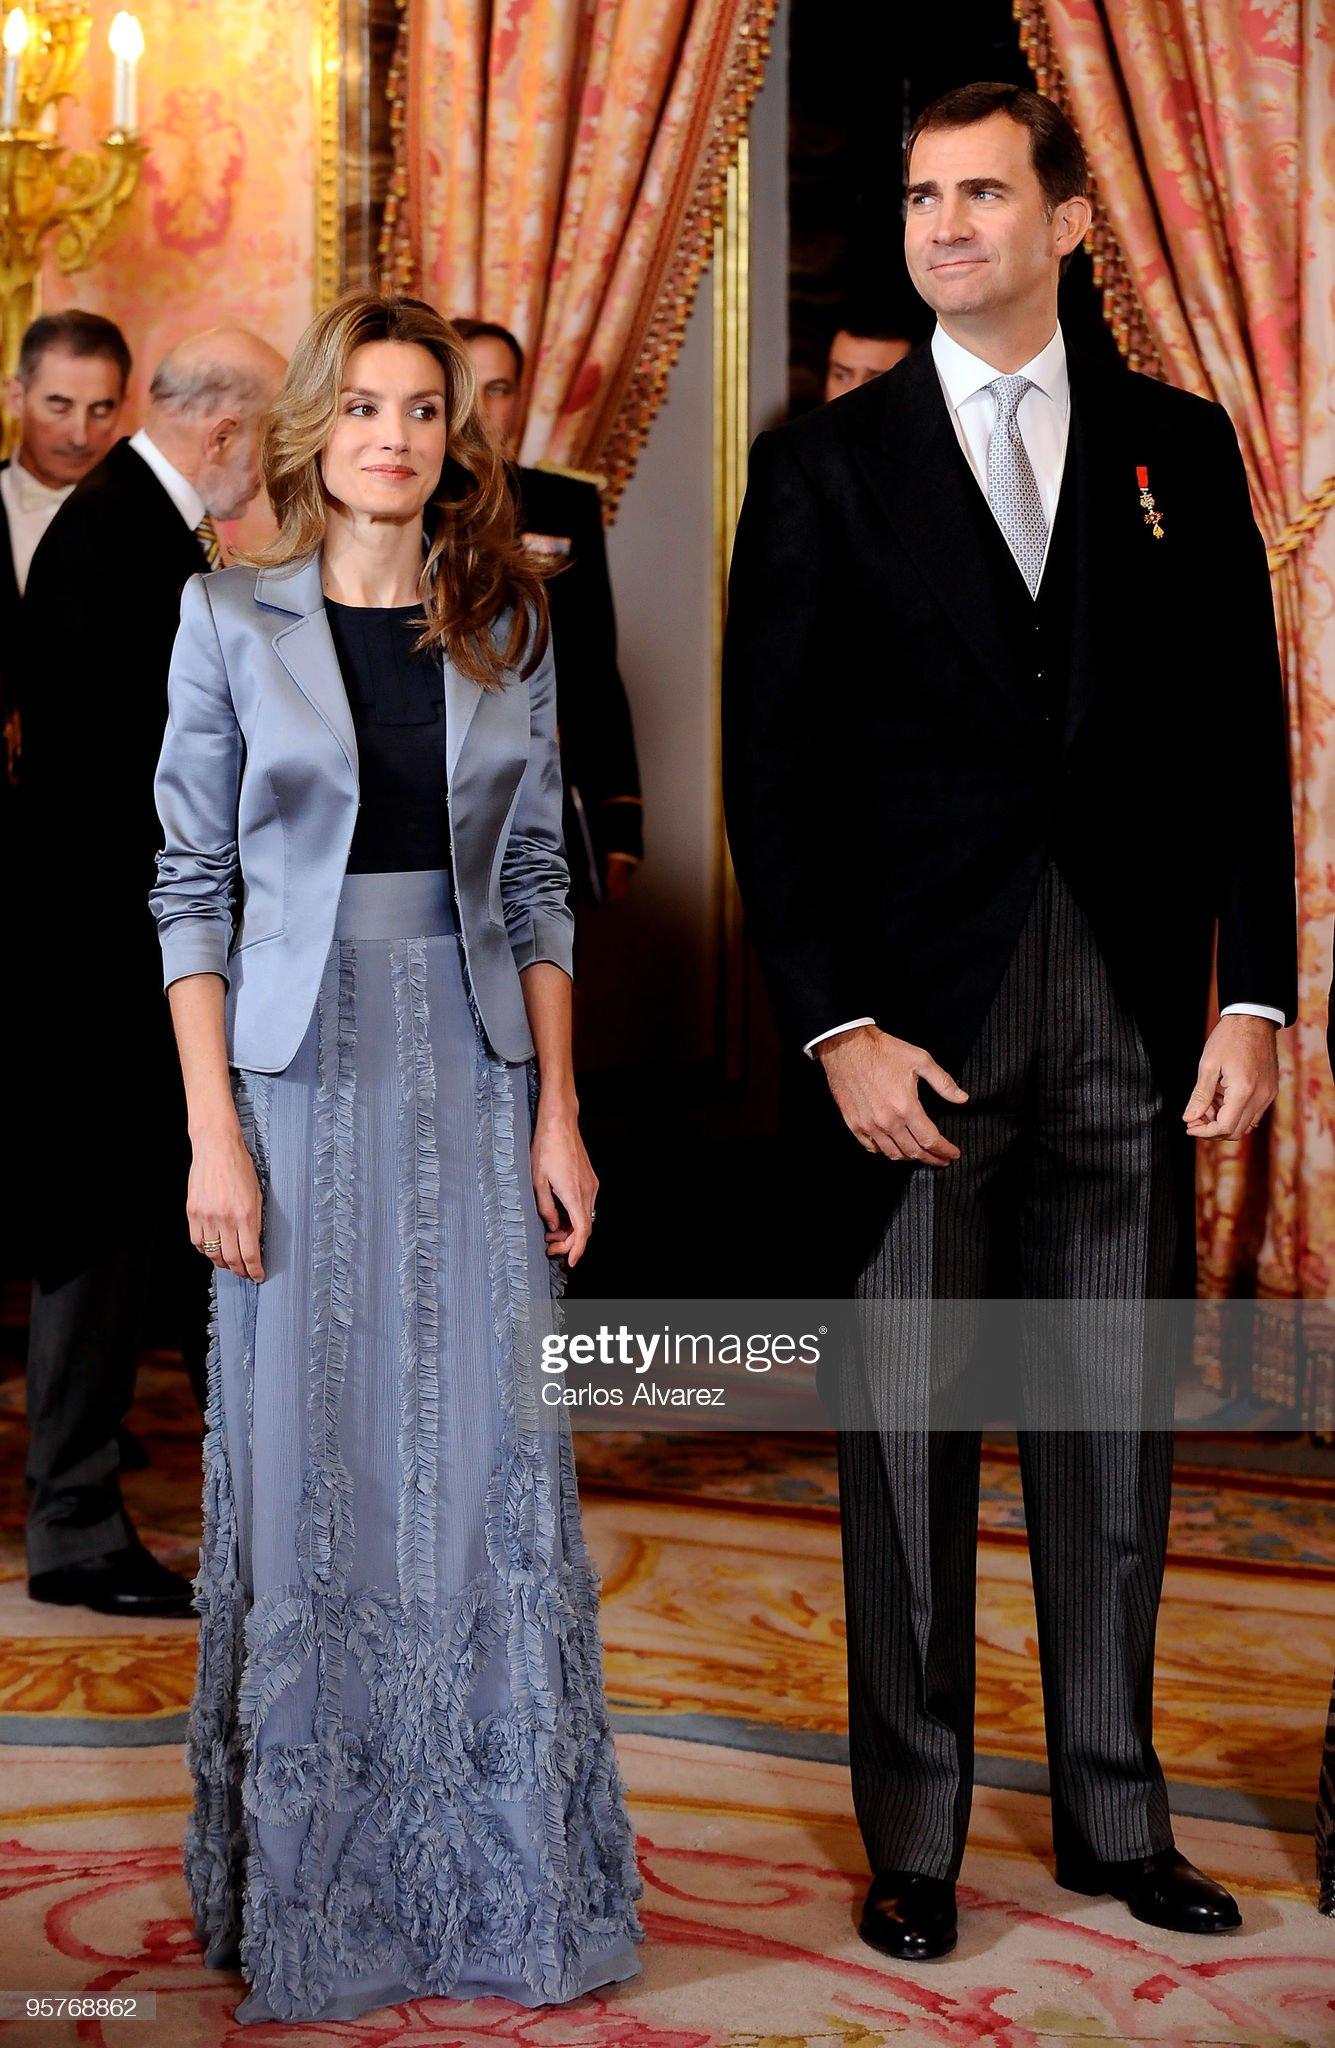 Spanish Royals Host Ambassadors Reception in Madrid : News Photo